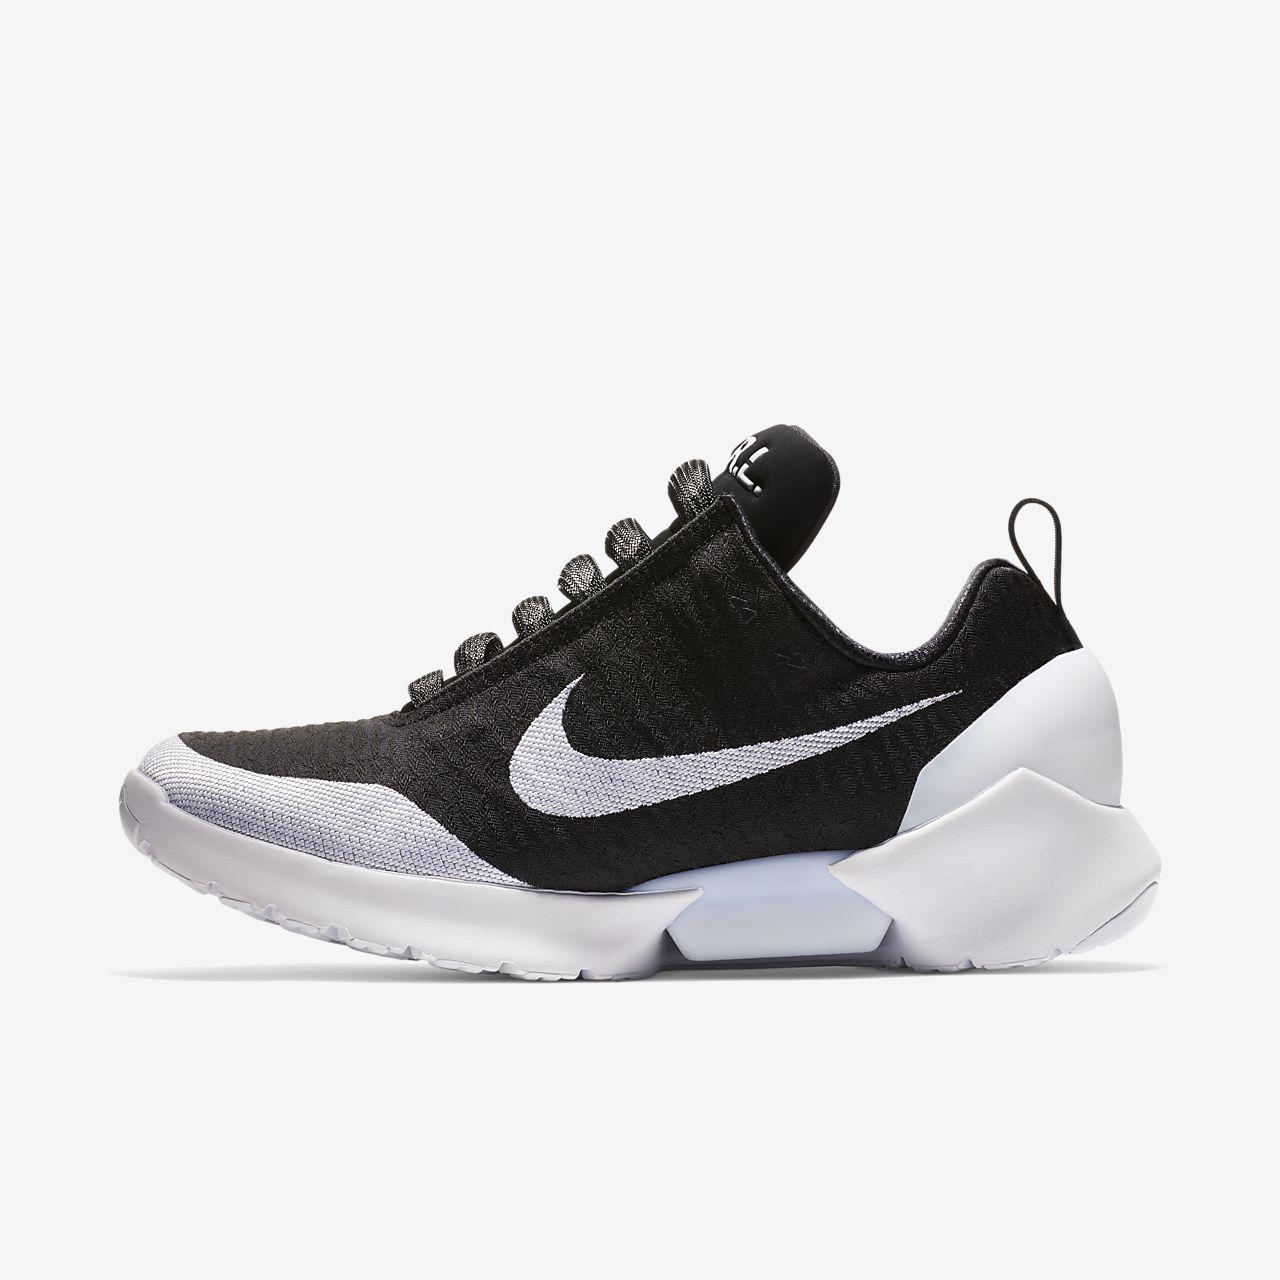 1 Nike Hyperadapt 0toma Hombre EuropeaZapatillas c3Rjq54AL